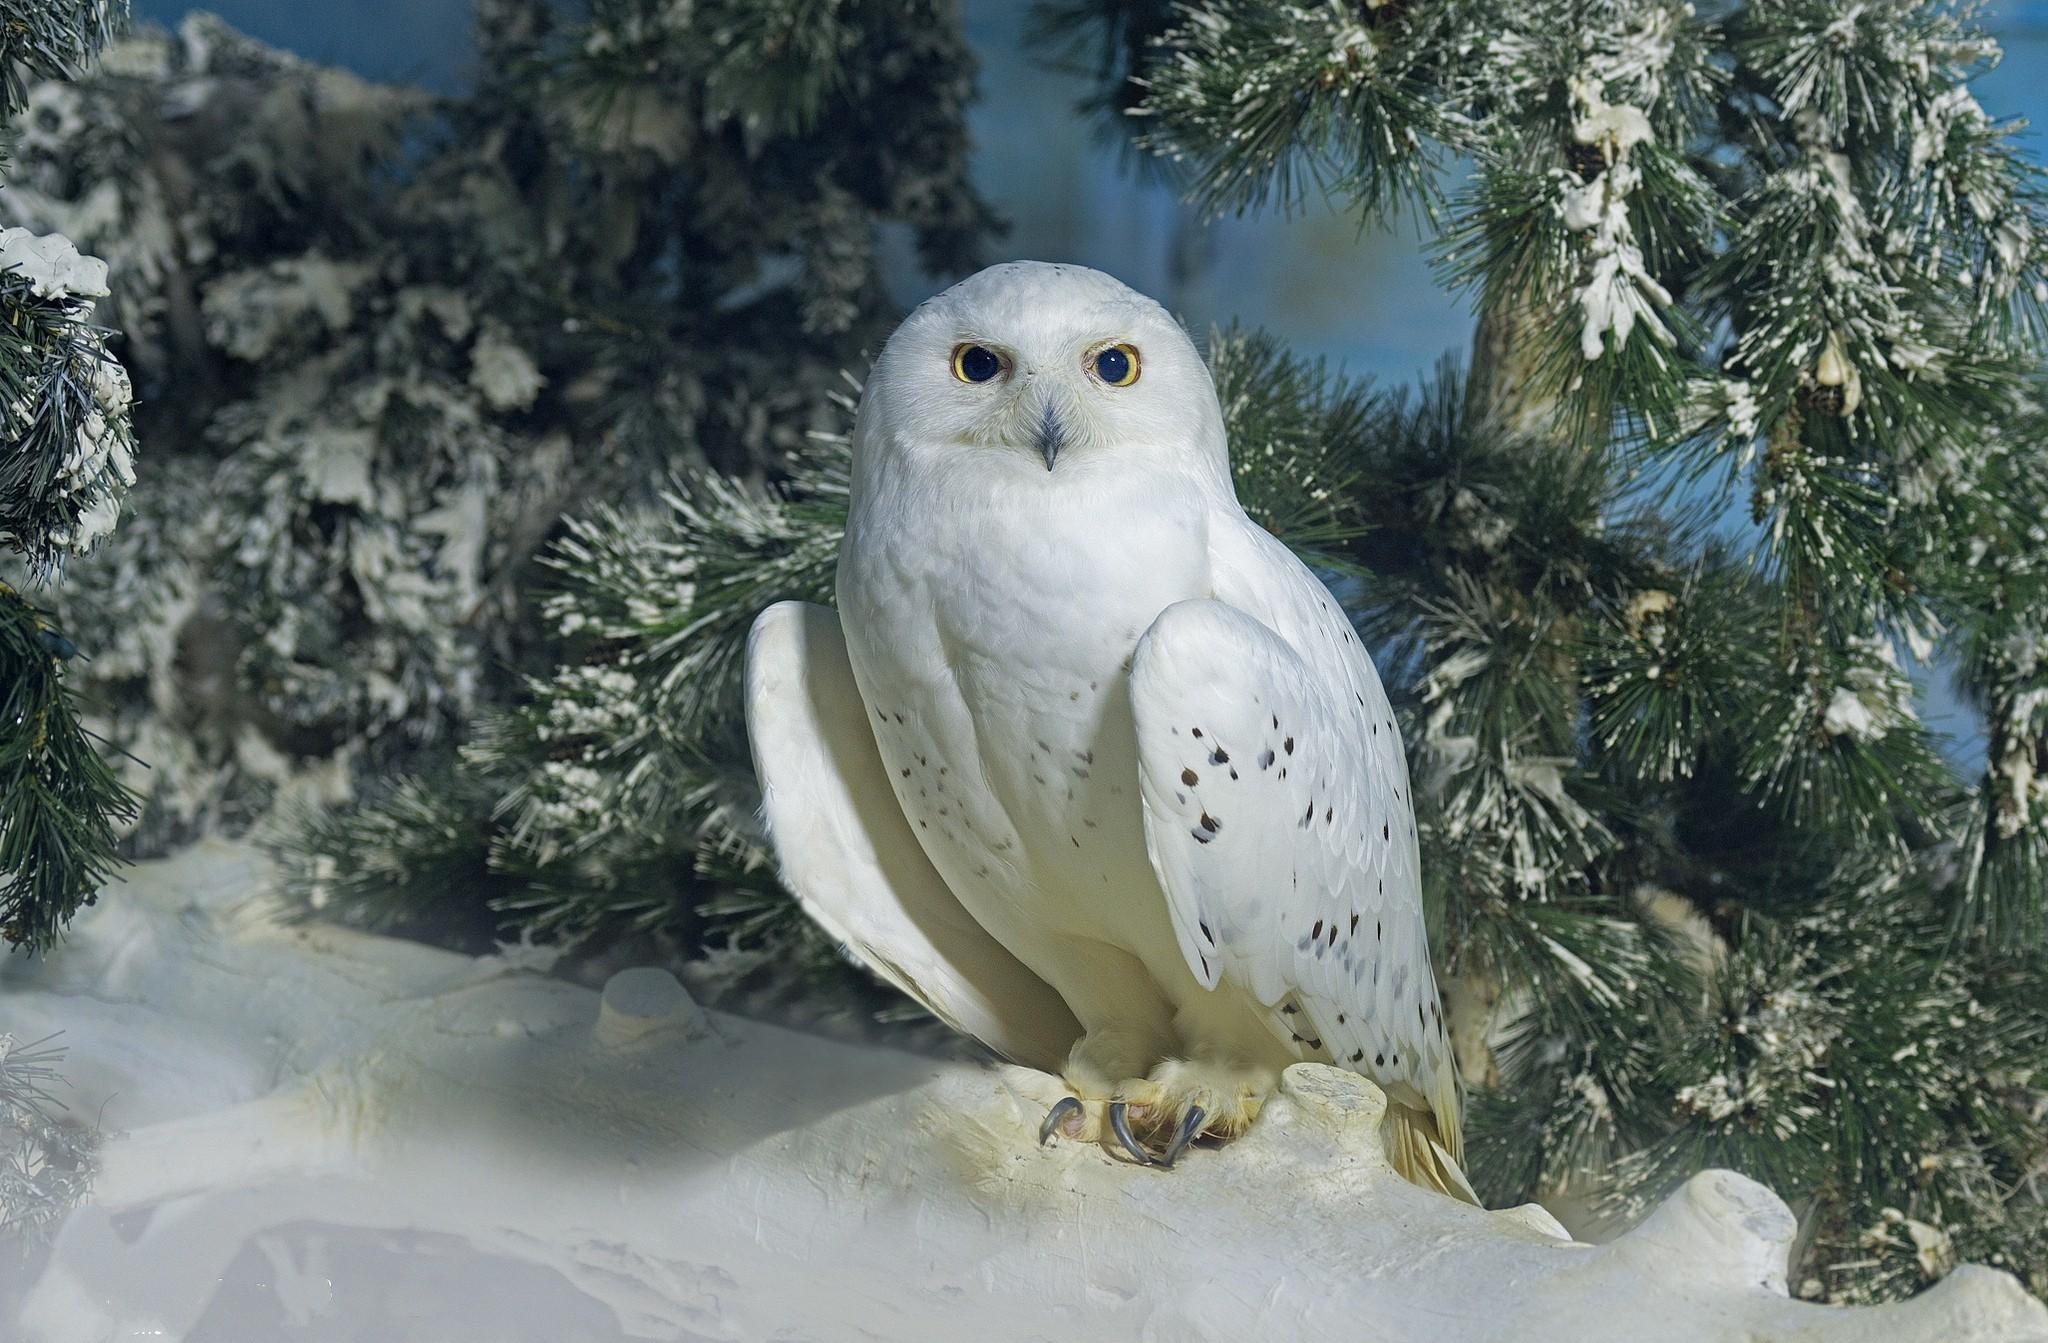 Djur – Snowy Owl Fir Tree Winter Bakgrund